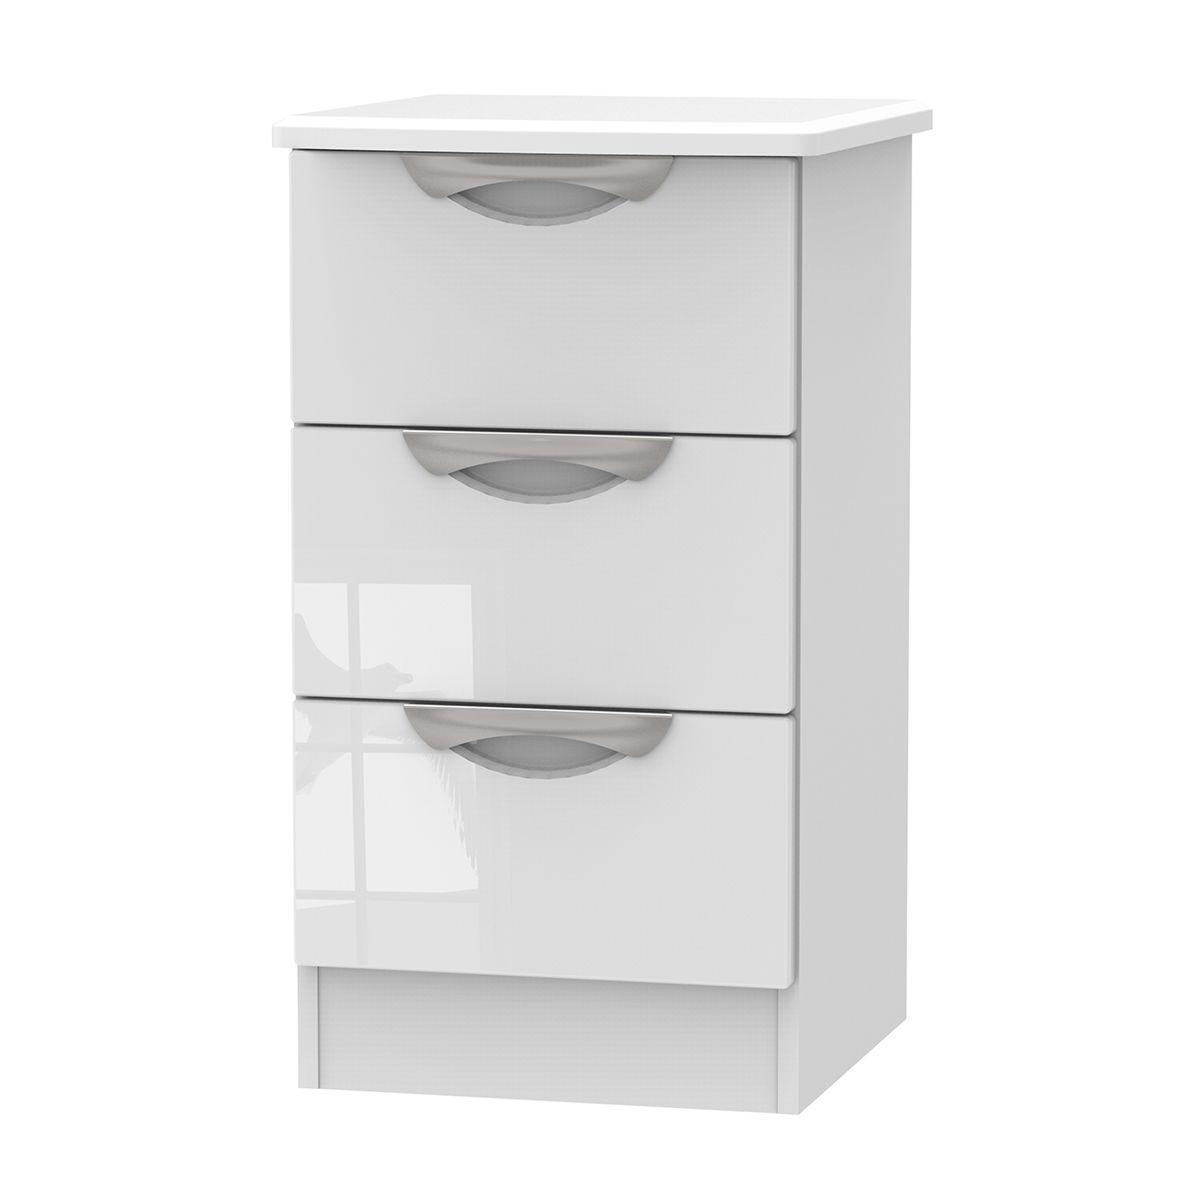 Indices 3-Drawer Bedside Cabinet - White